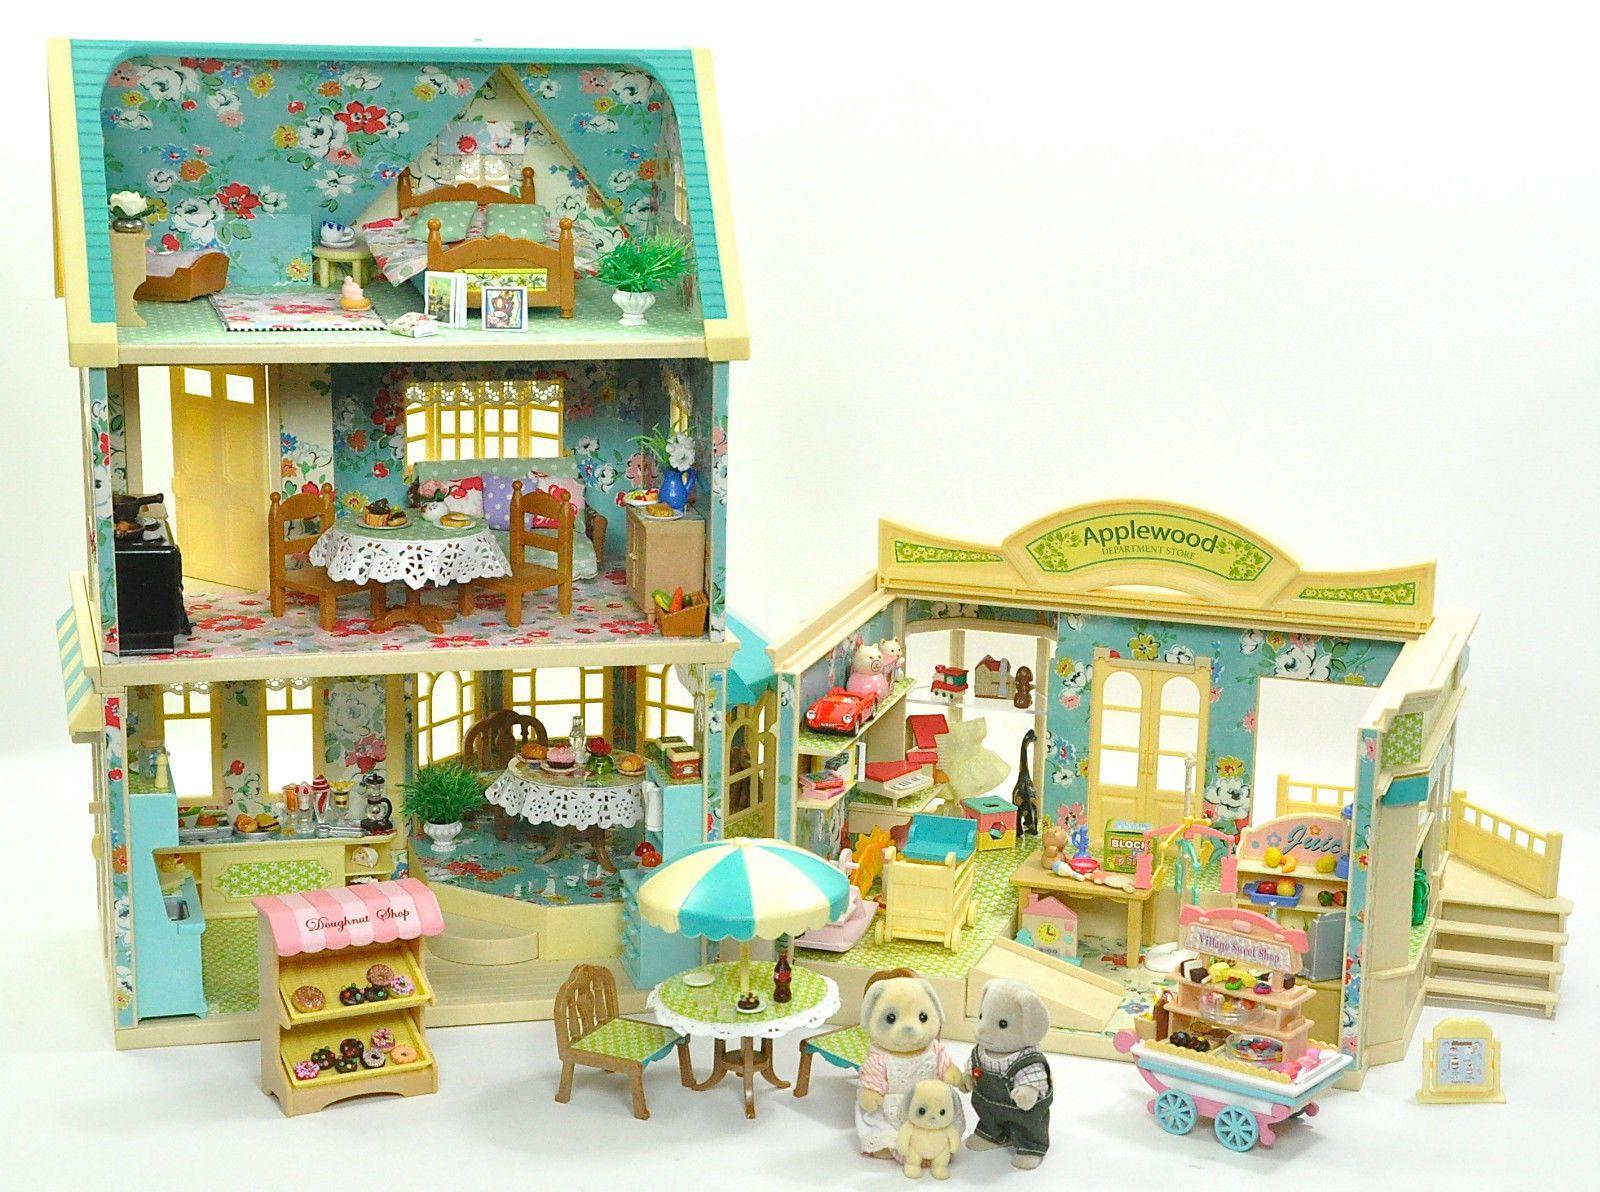 Sylvanian Families decorado Applewood House/Café/tienda De Figuras ...